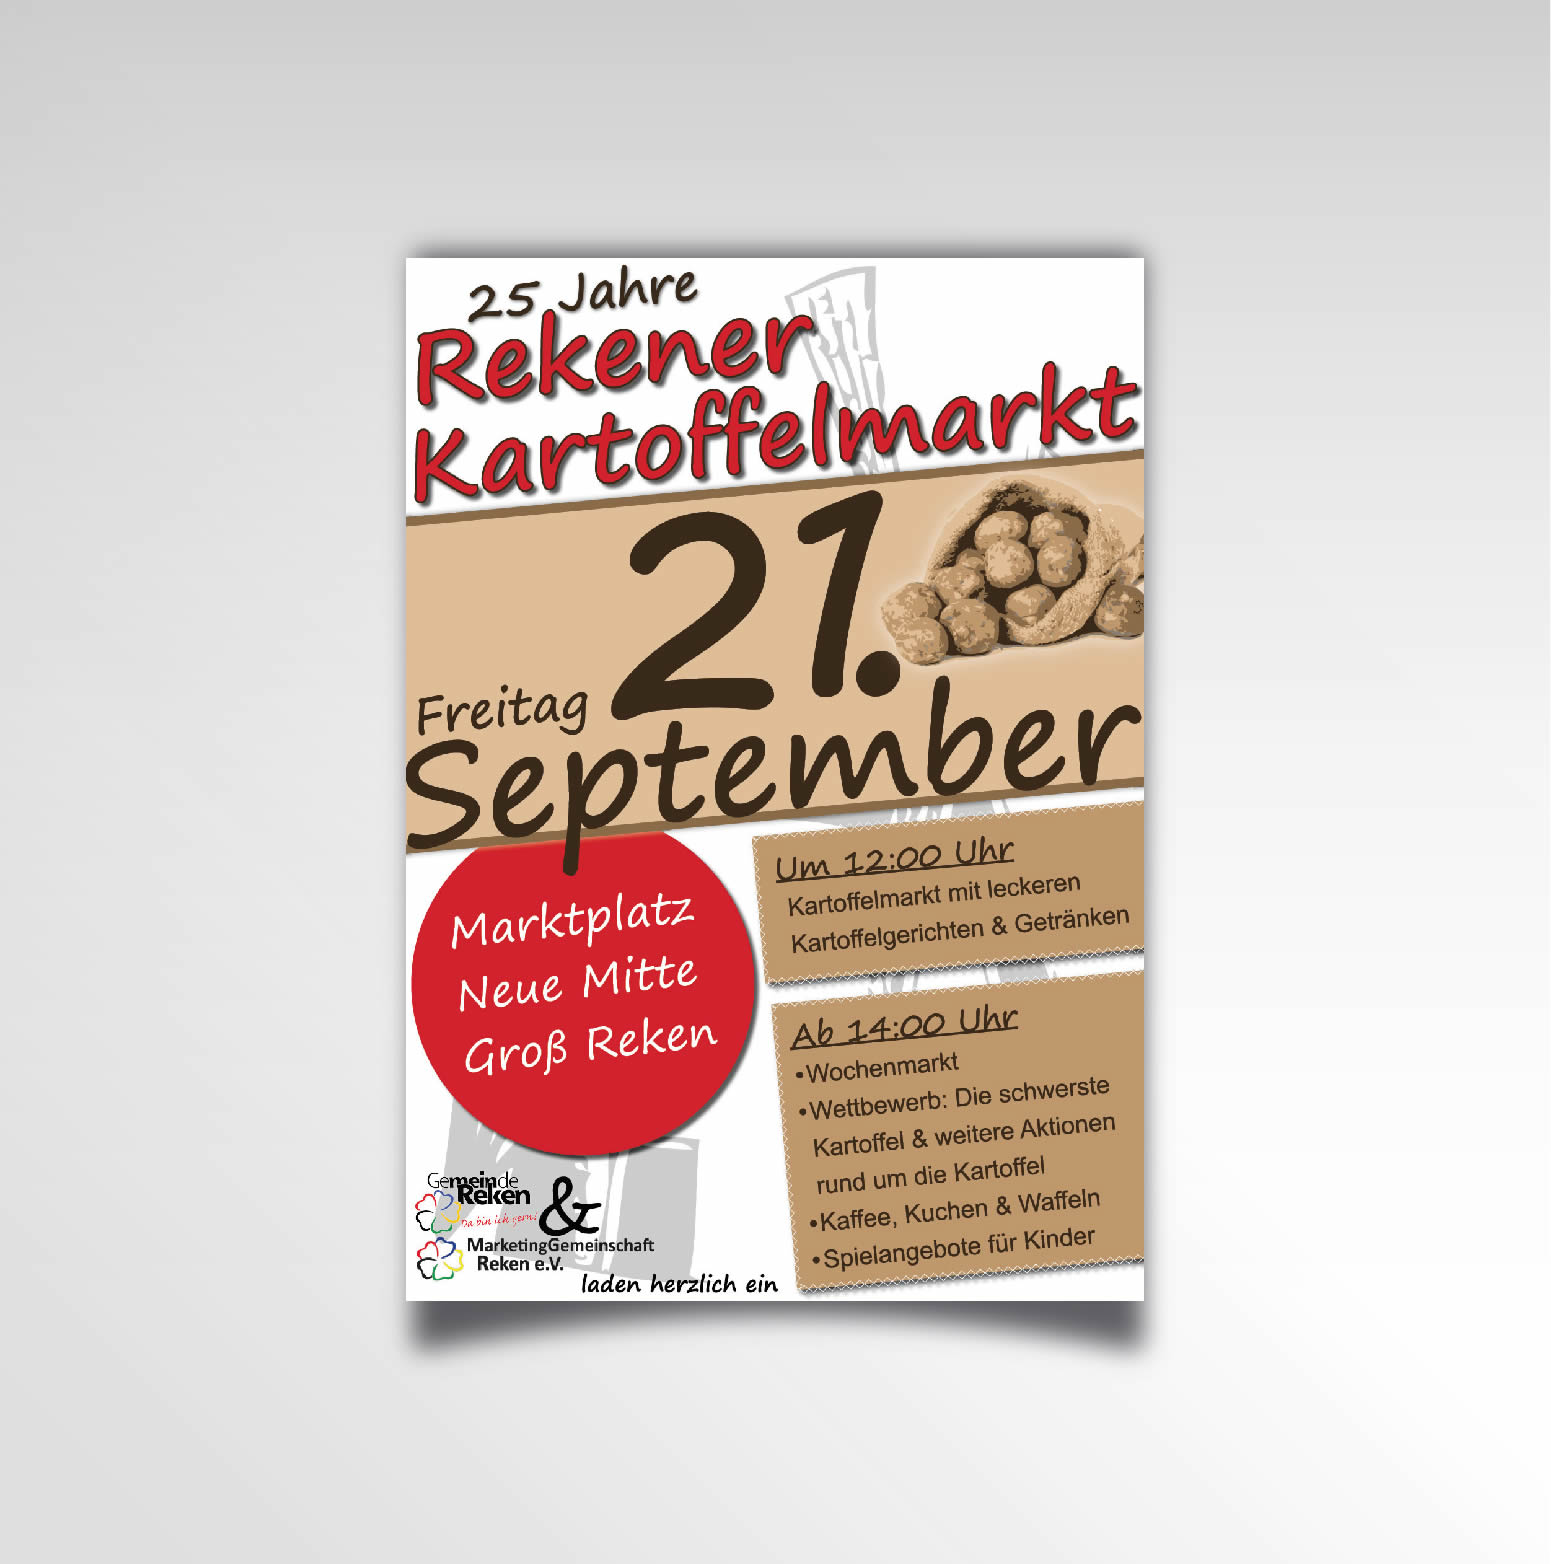 Rekener Kartoffelmarkt Plakat Printprodukt Poster Marketinggemeinschaft Reken